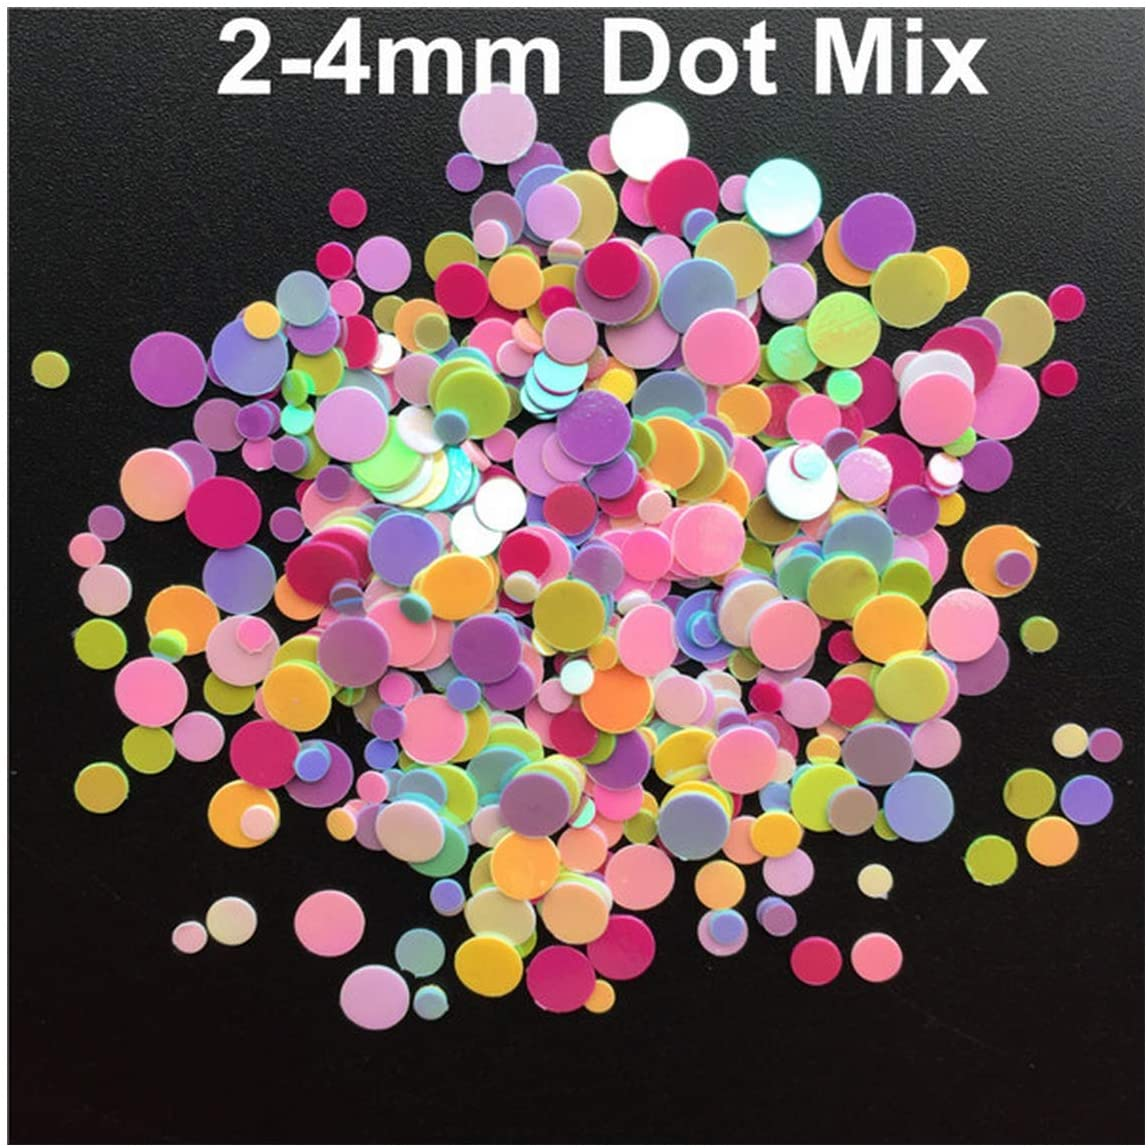 Dot Shape PVC Loose Sequins Glitter Paillettes for Nail Art Manicure/Sewing/Wedding Decoration,Ab Mix,4Mm Dot 20G